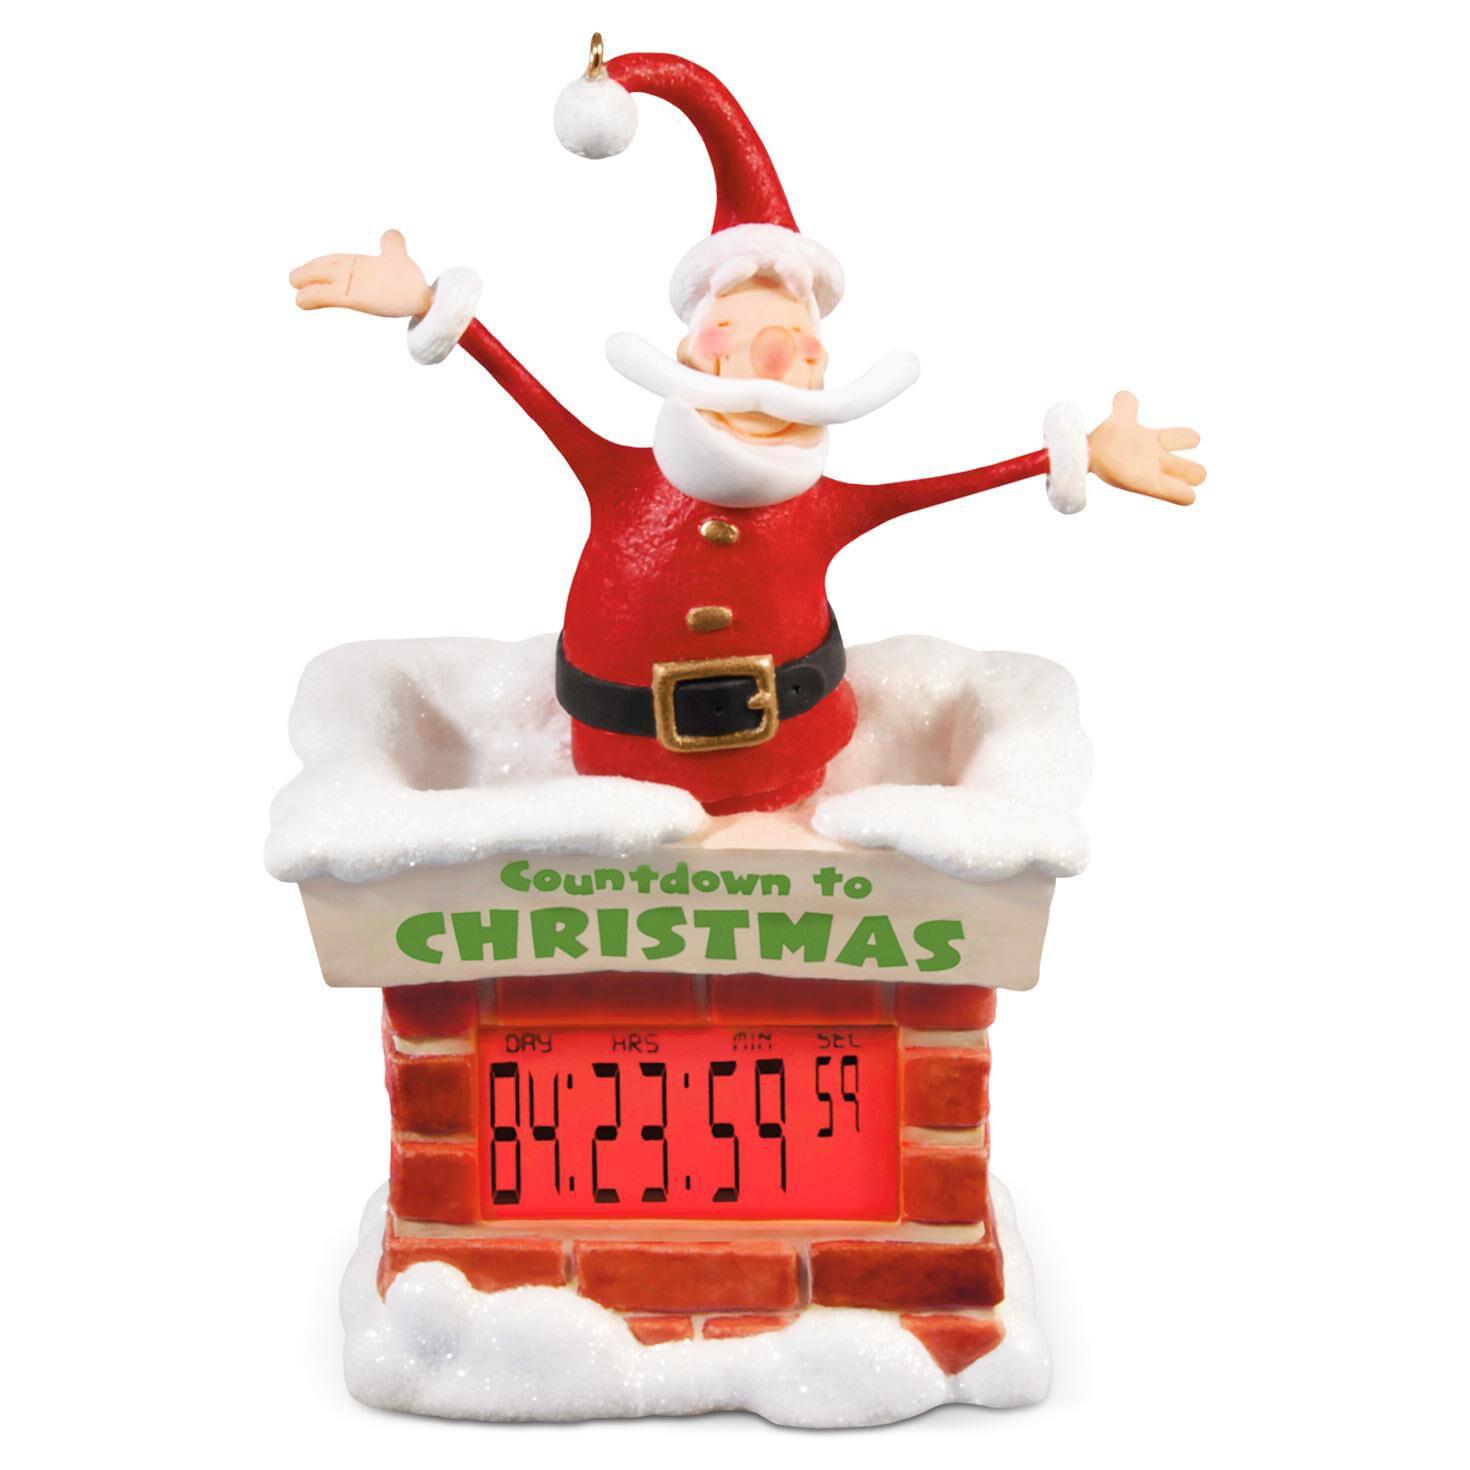 Countdown to Christmas Santa Countdown Clock Ornament - Keepsake ...